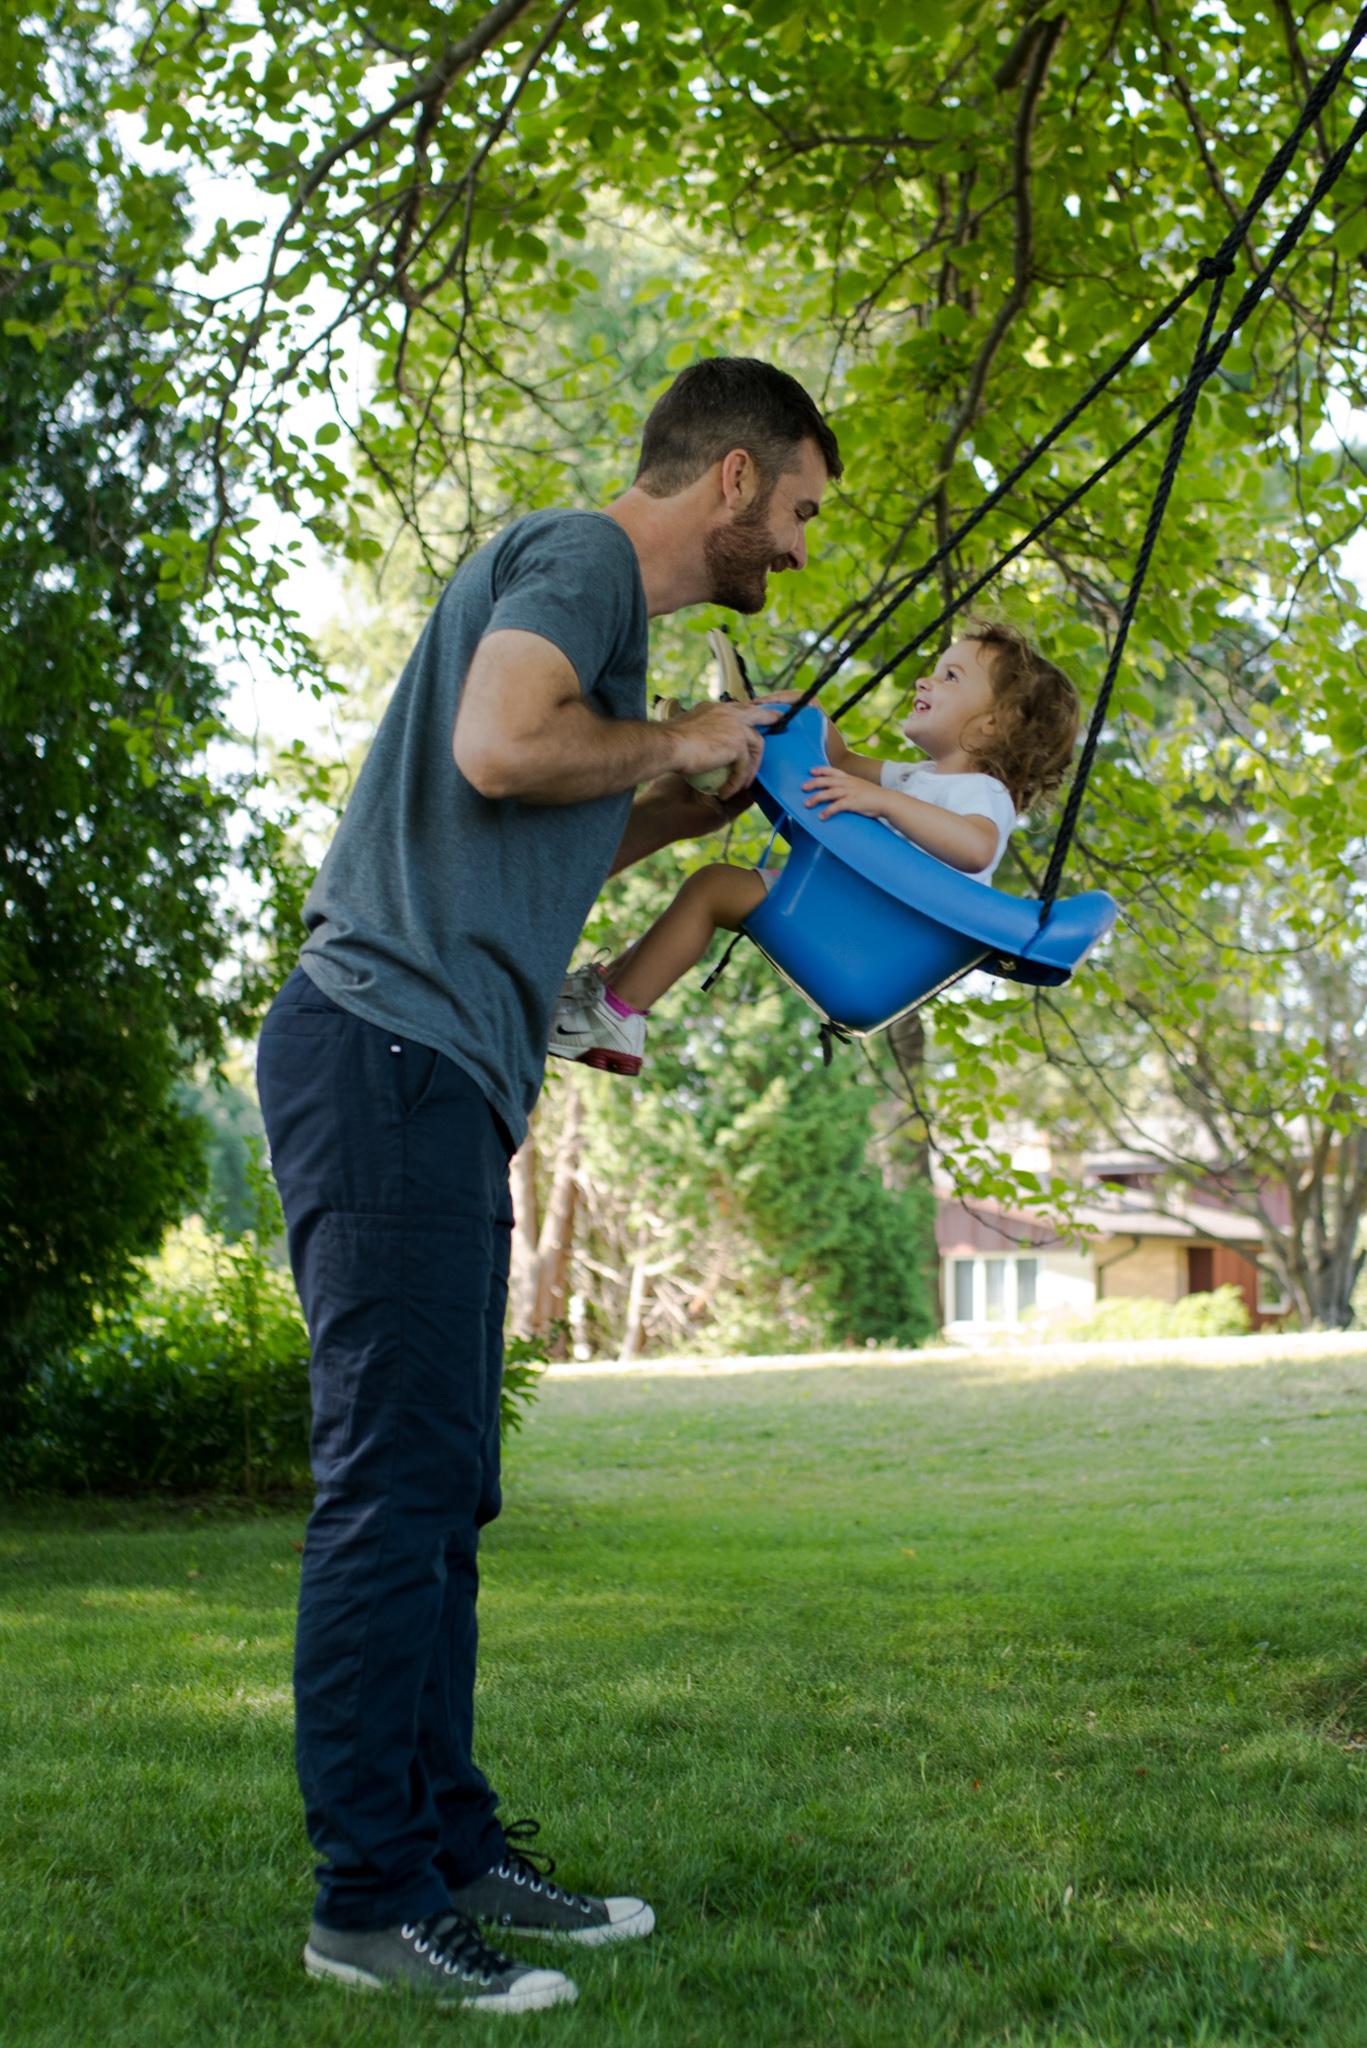 dad smiling at daughter in swing